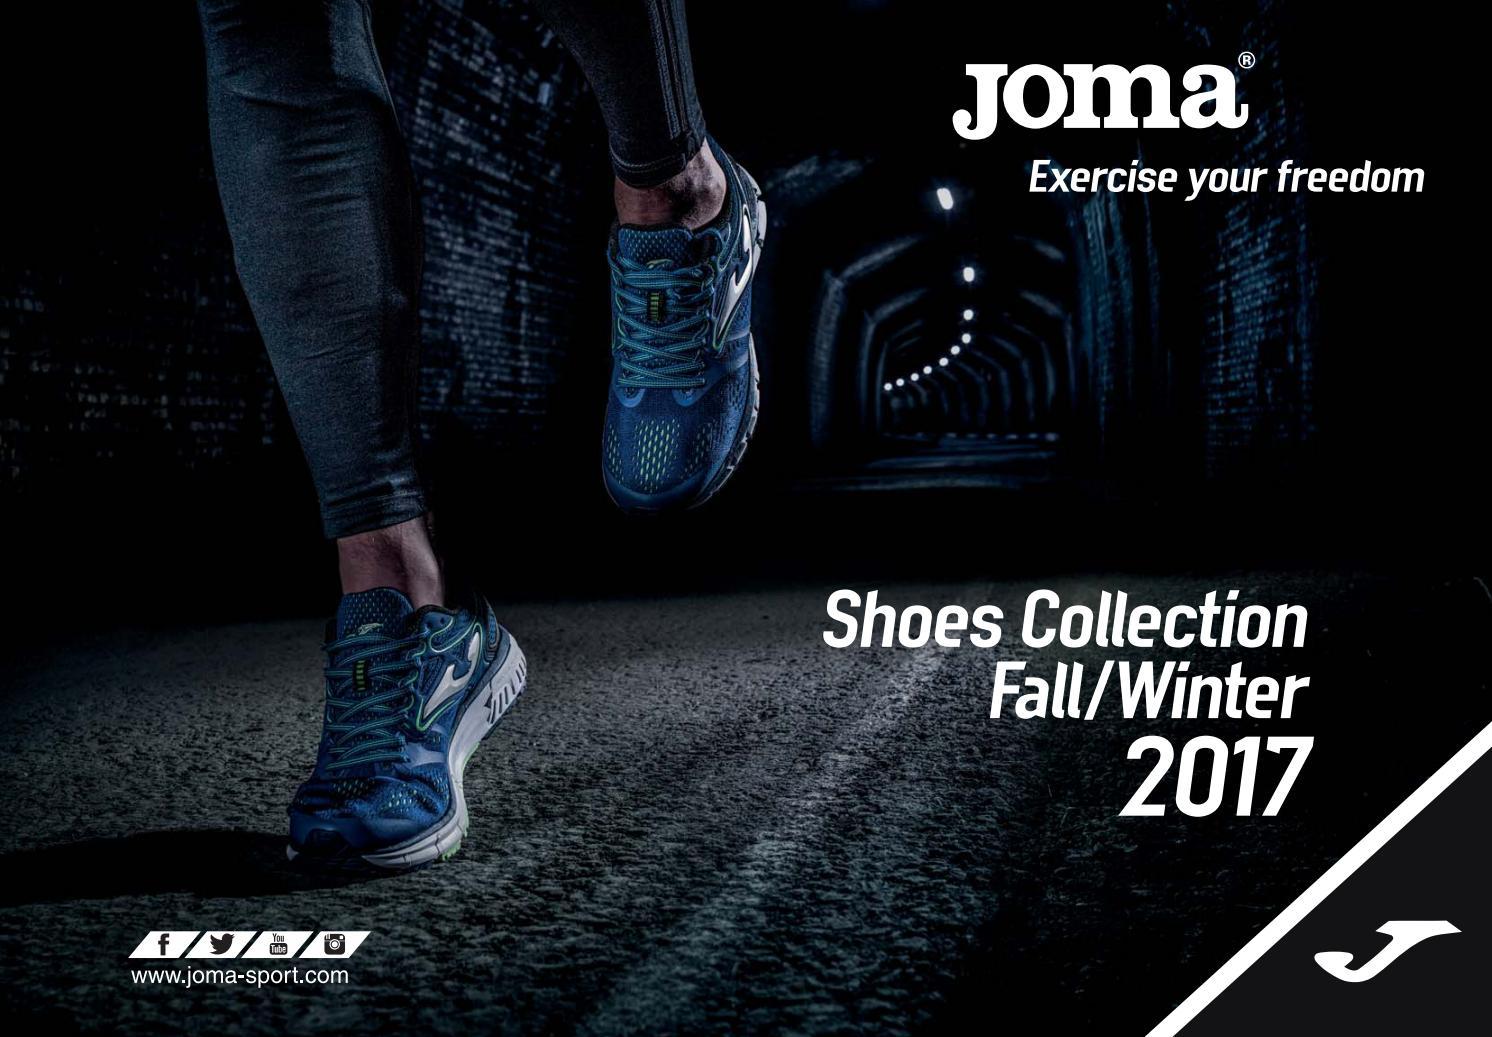 f9ec0b6d1773e JOMA shoes fall winter 2017 by joma-sport - issuu